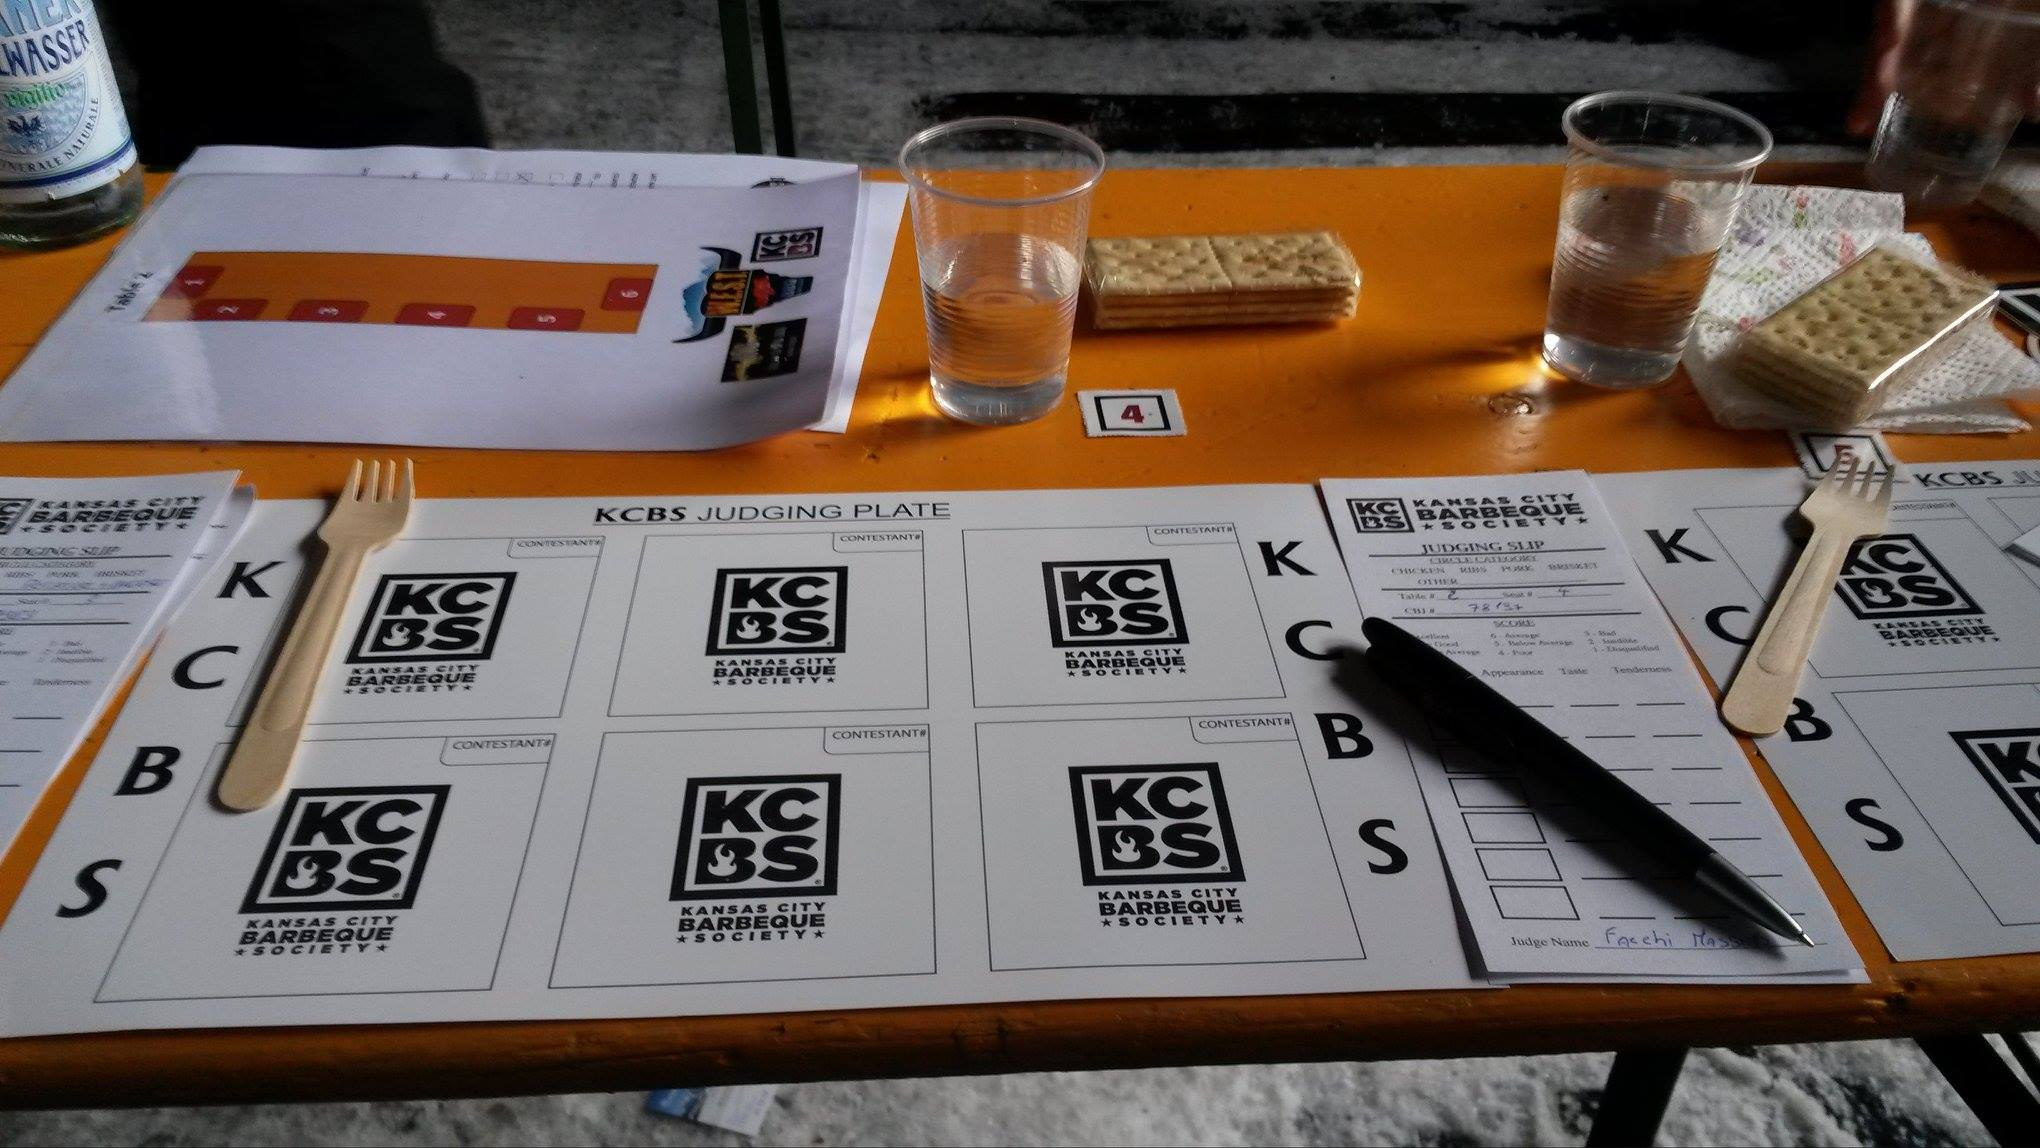 KCBS_Judging